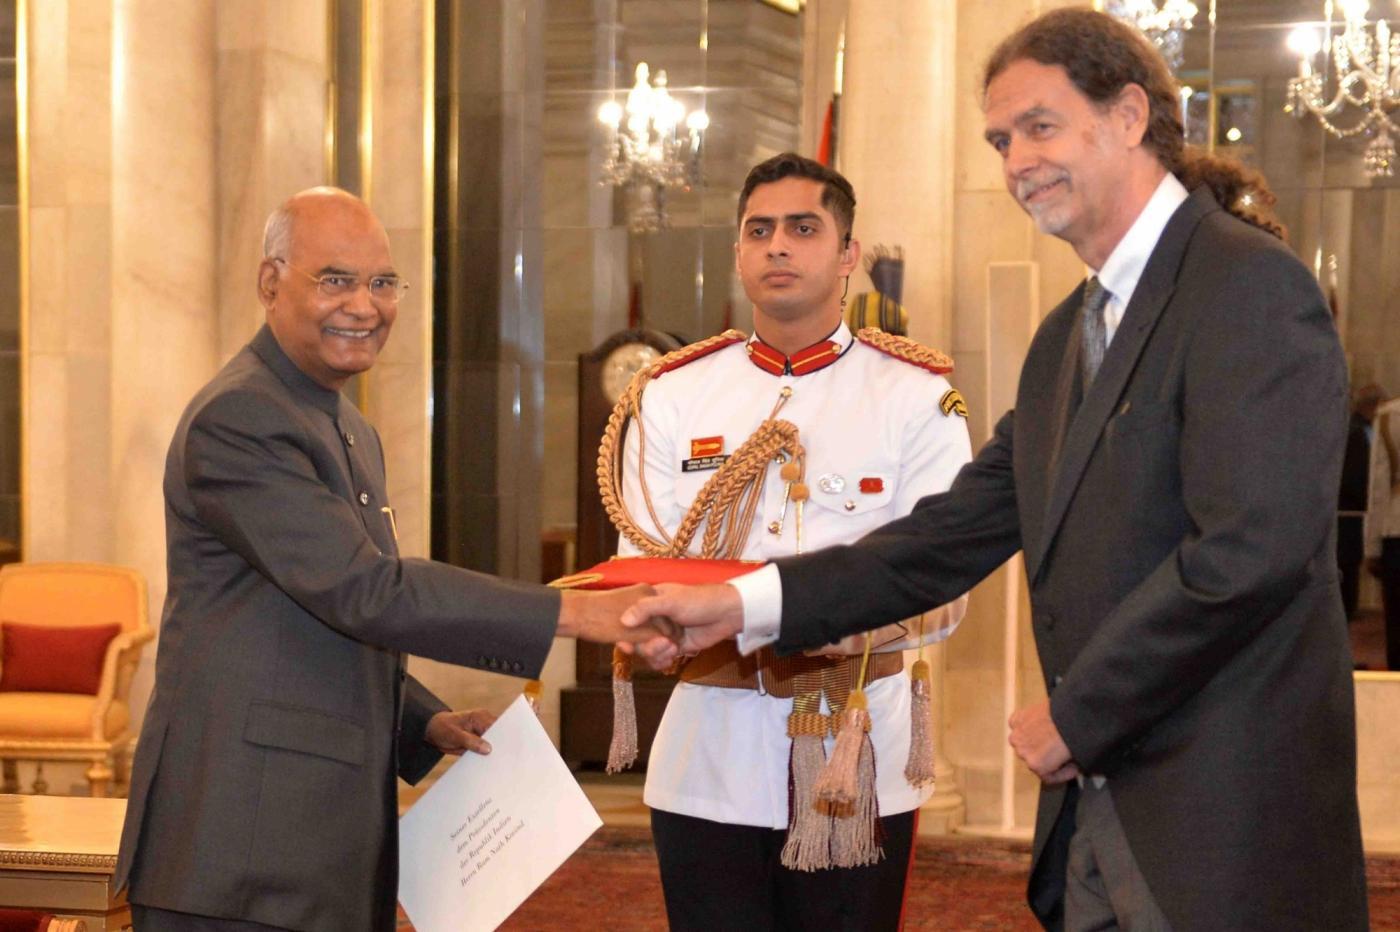 New Delhi: German Ambassador designate H.E. Walter Johannes Lindner presents his credentials to President Ram Nath Kovind at Rashtrapati Bhavan in New Delhi on May 21, 2019. (Photo: IANS/RB) by .